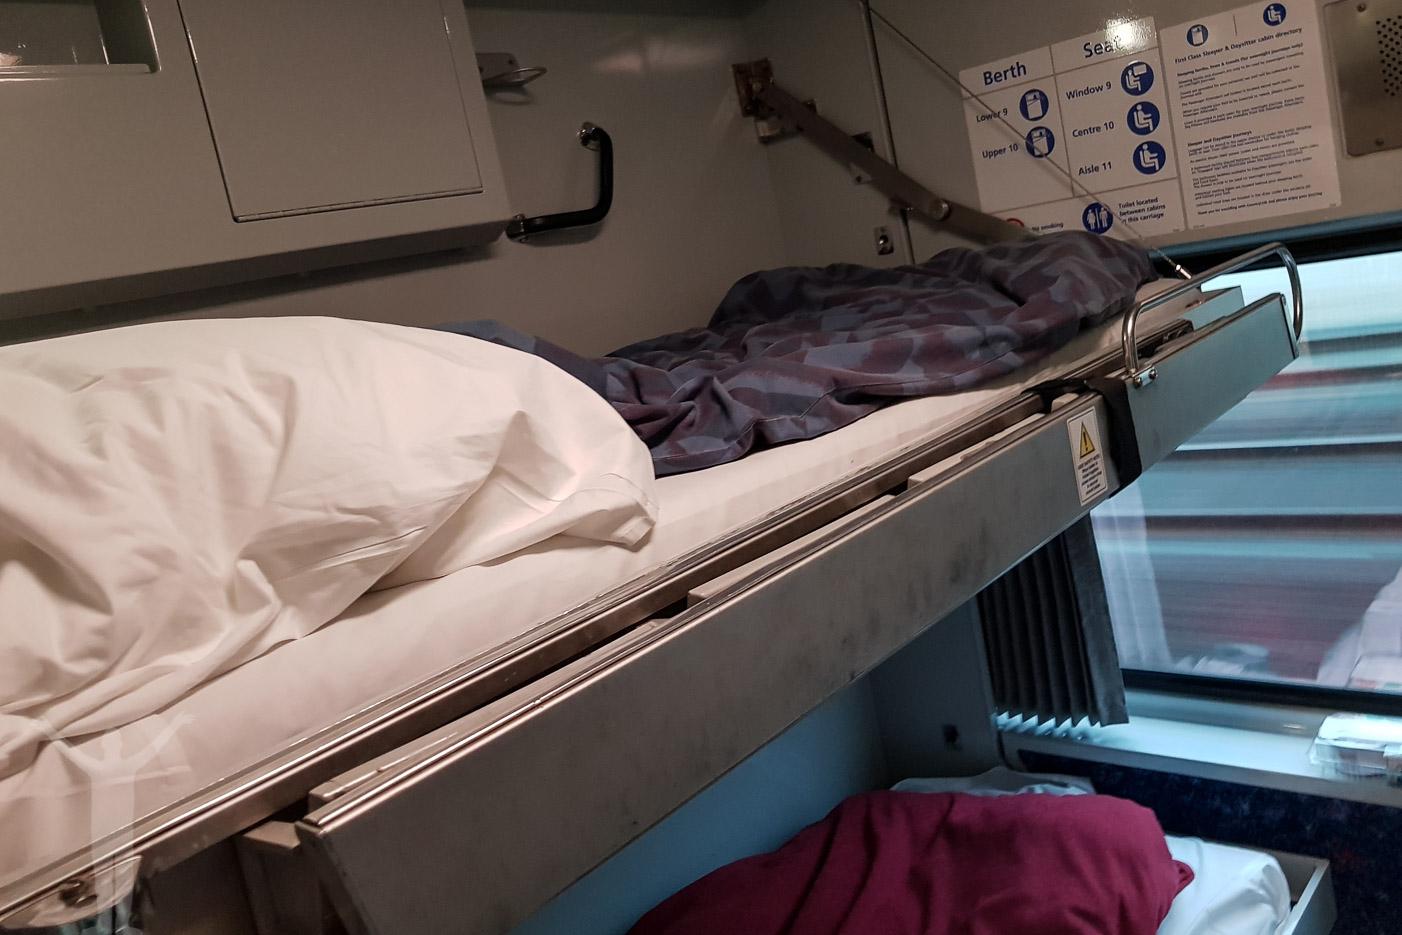 Överslafen i sovvagnen